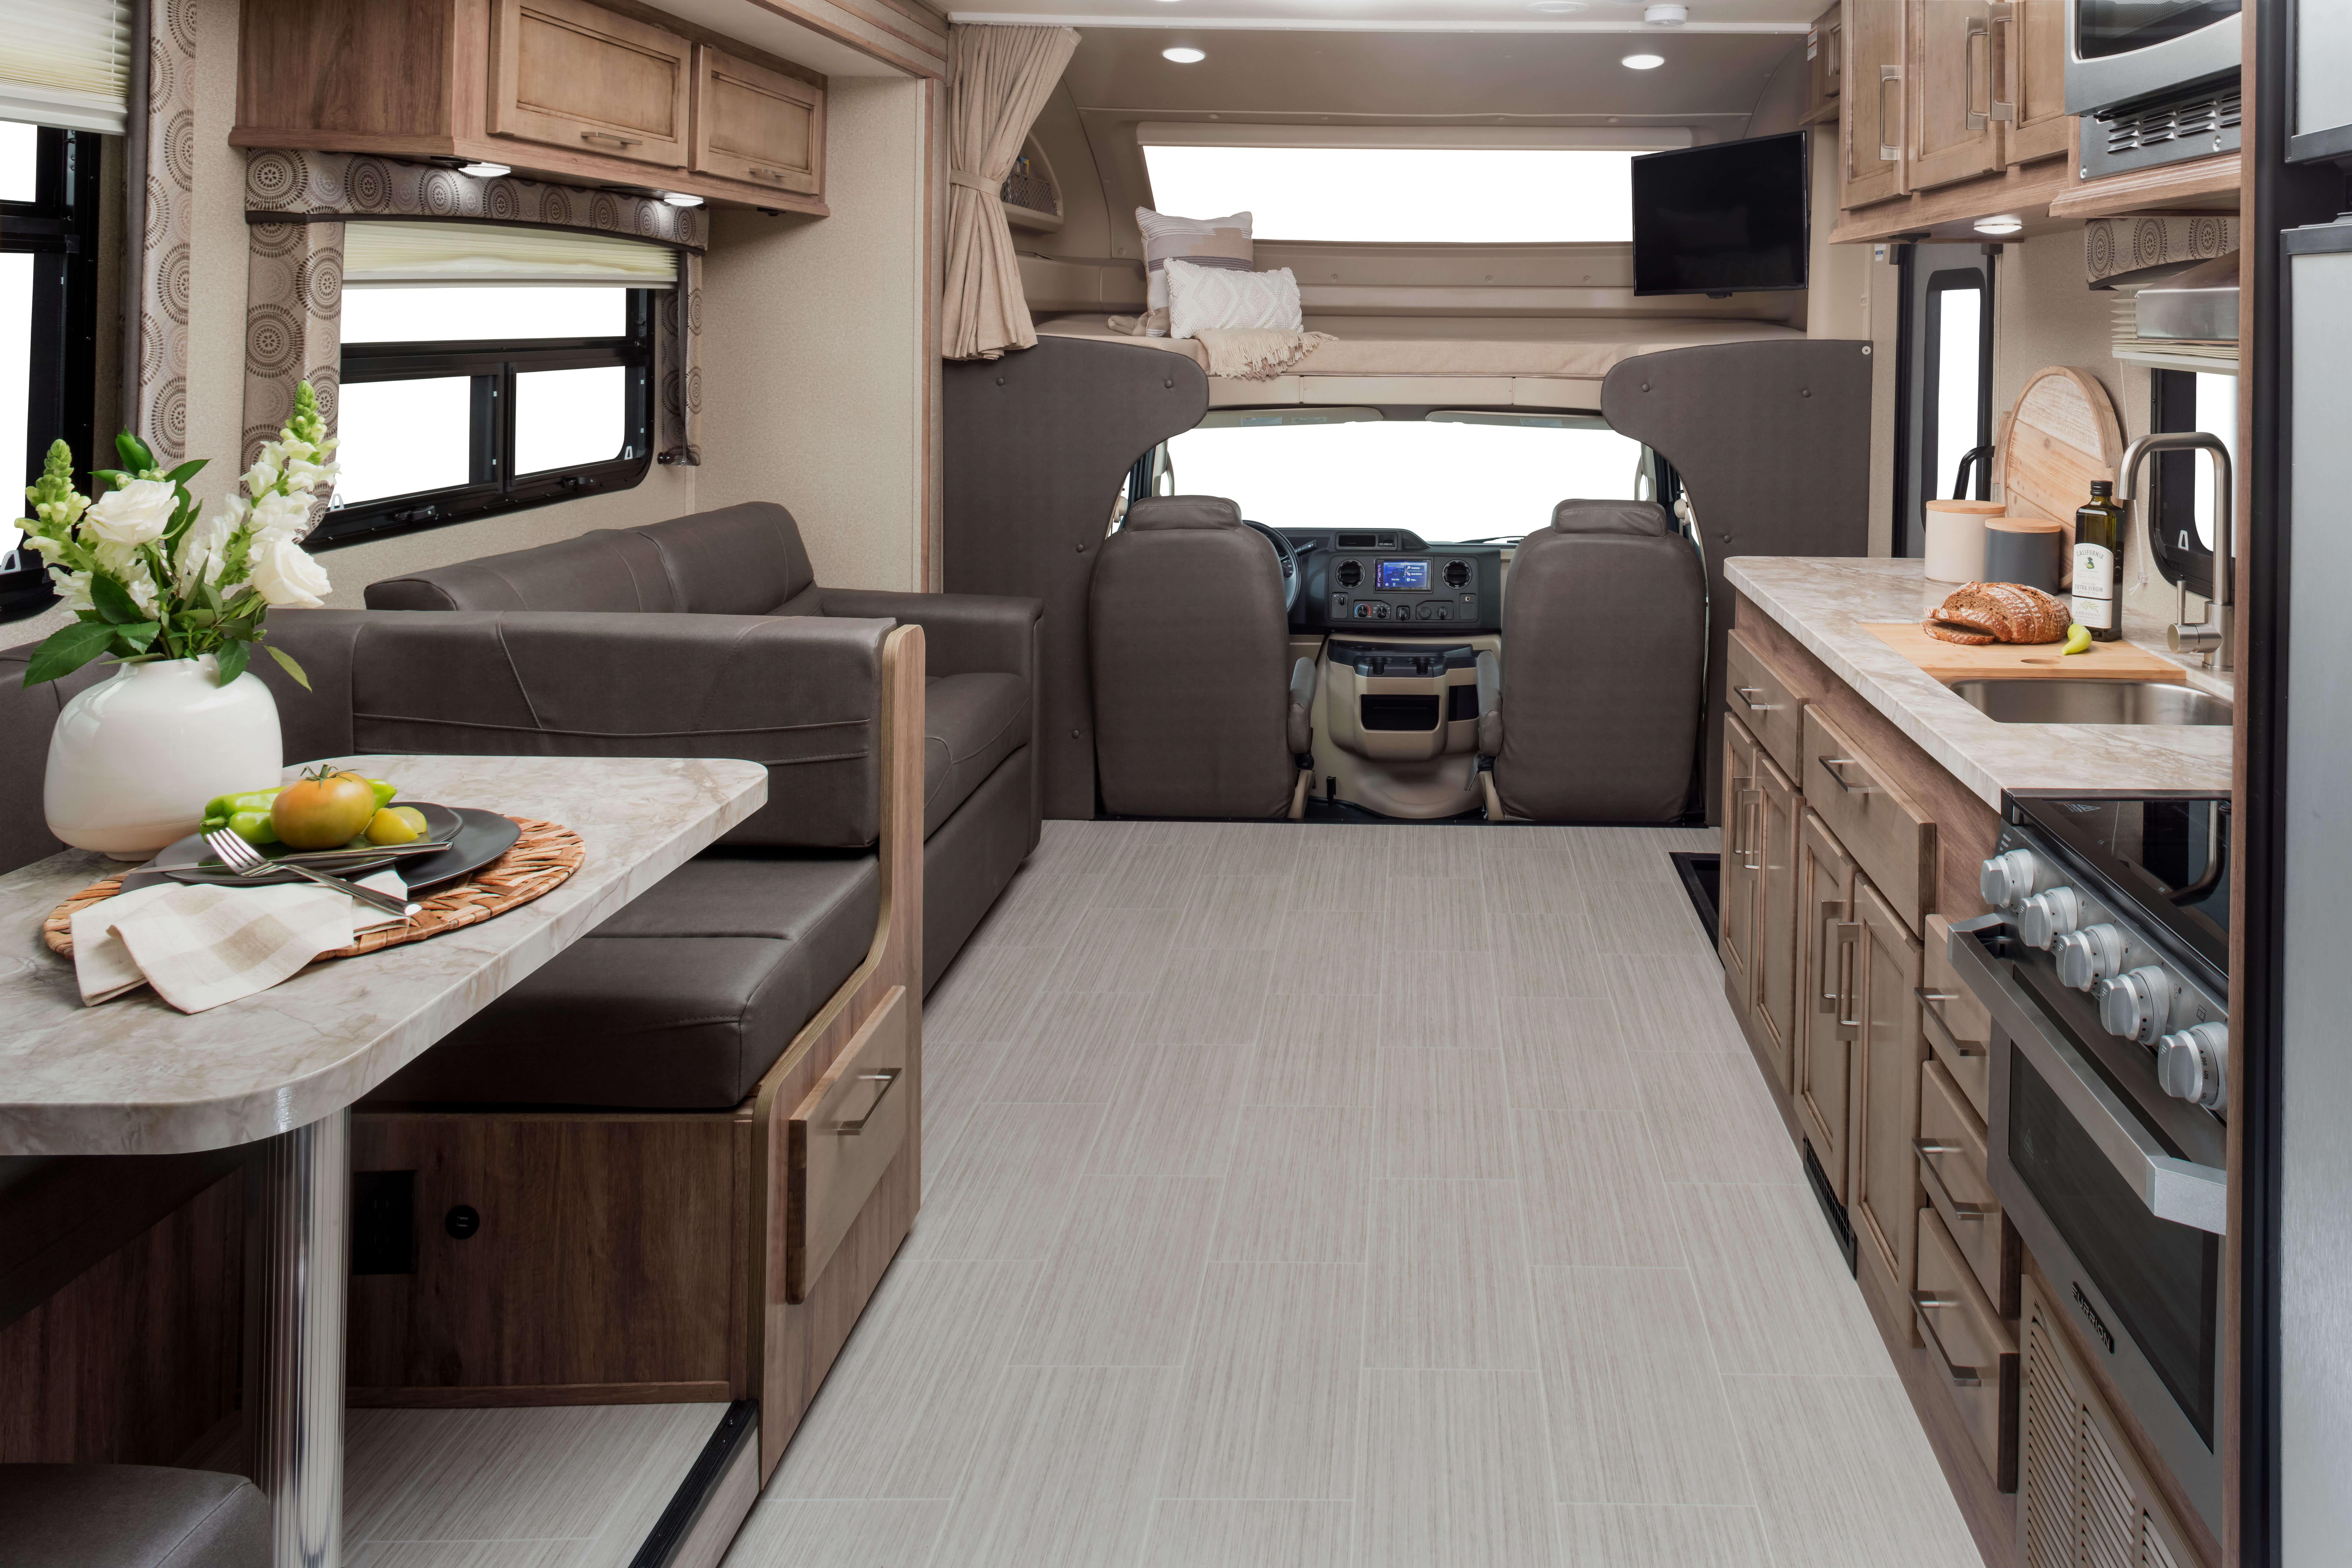 The 2020 Odyssey Class C Motorhome | Entegra Coach